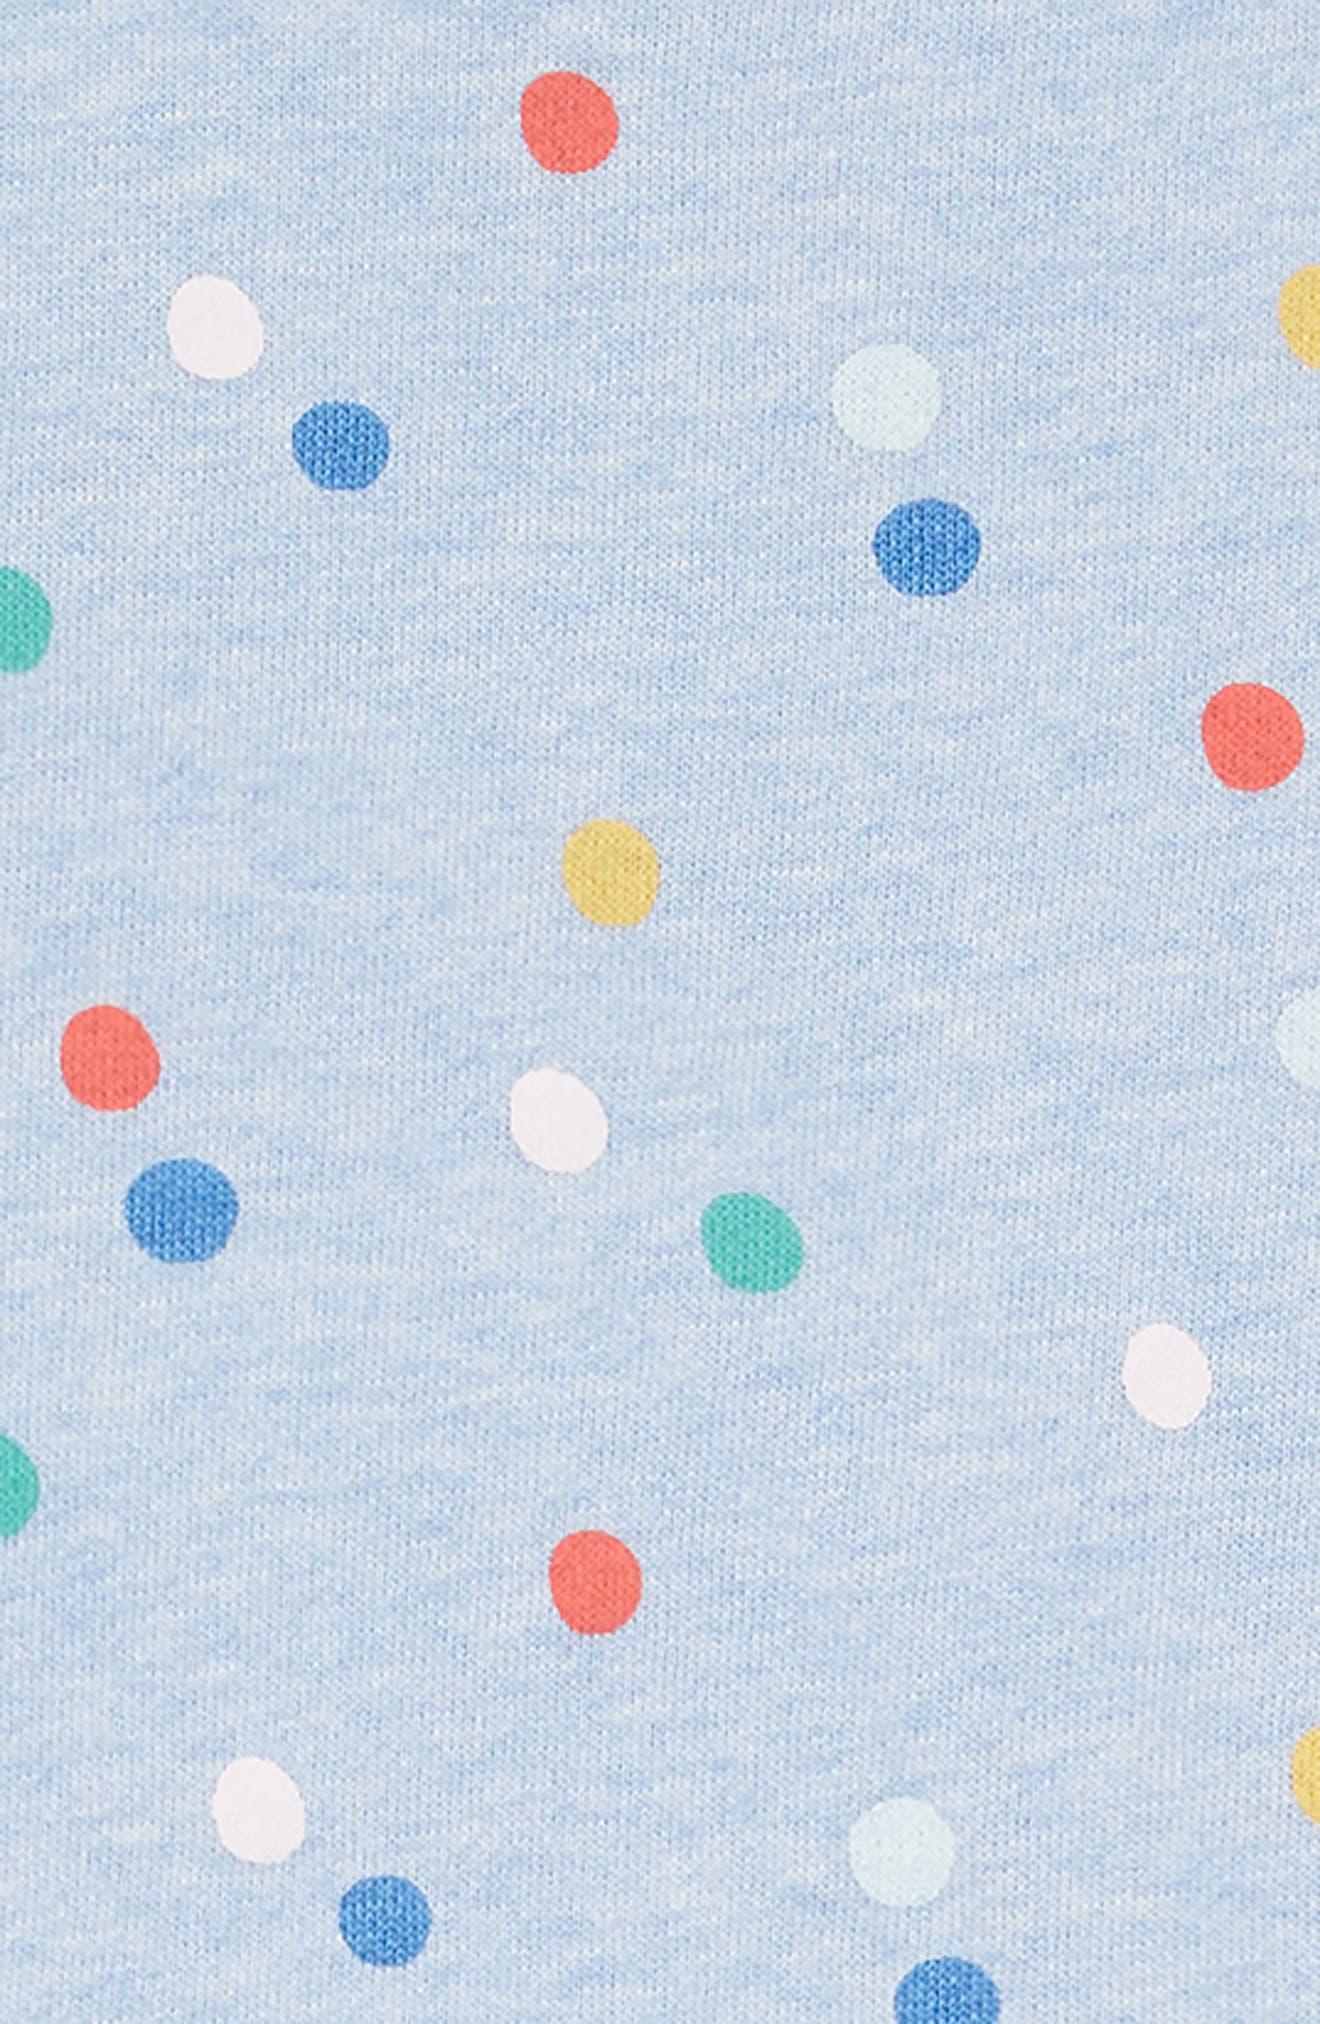 Colorful Cozy Dress,                             Alternate thumbnail 3, color,                             MUL MULTI PAINTED SPOT